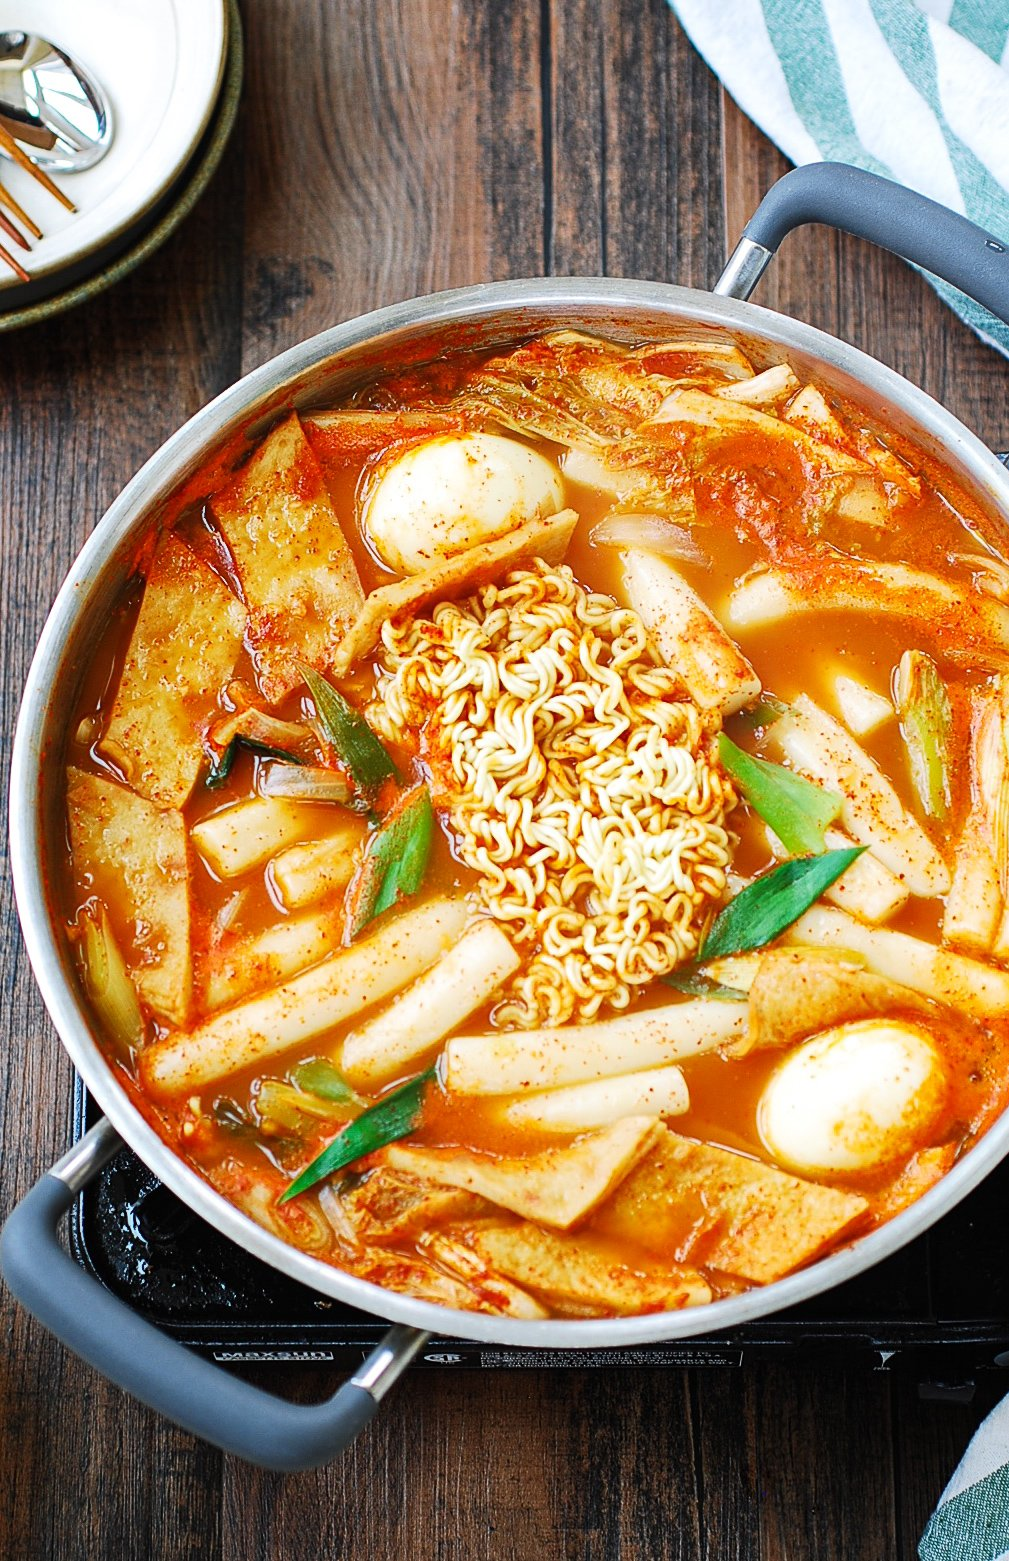 DSC 1819 2 - Soupy Tteokbokki (Spicy Braised Rice Cake)